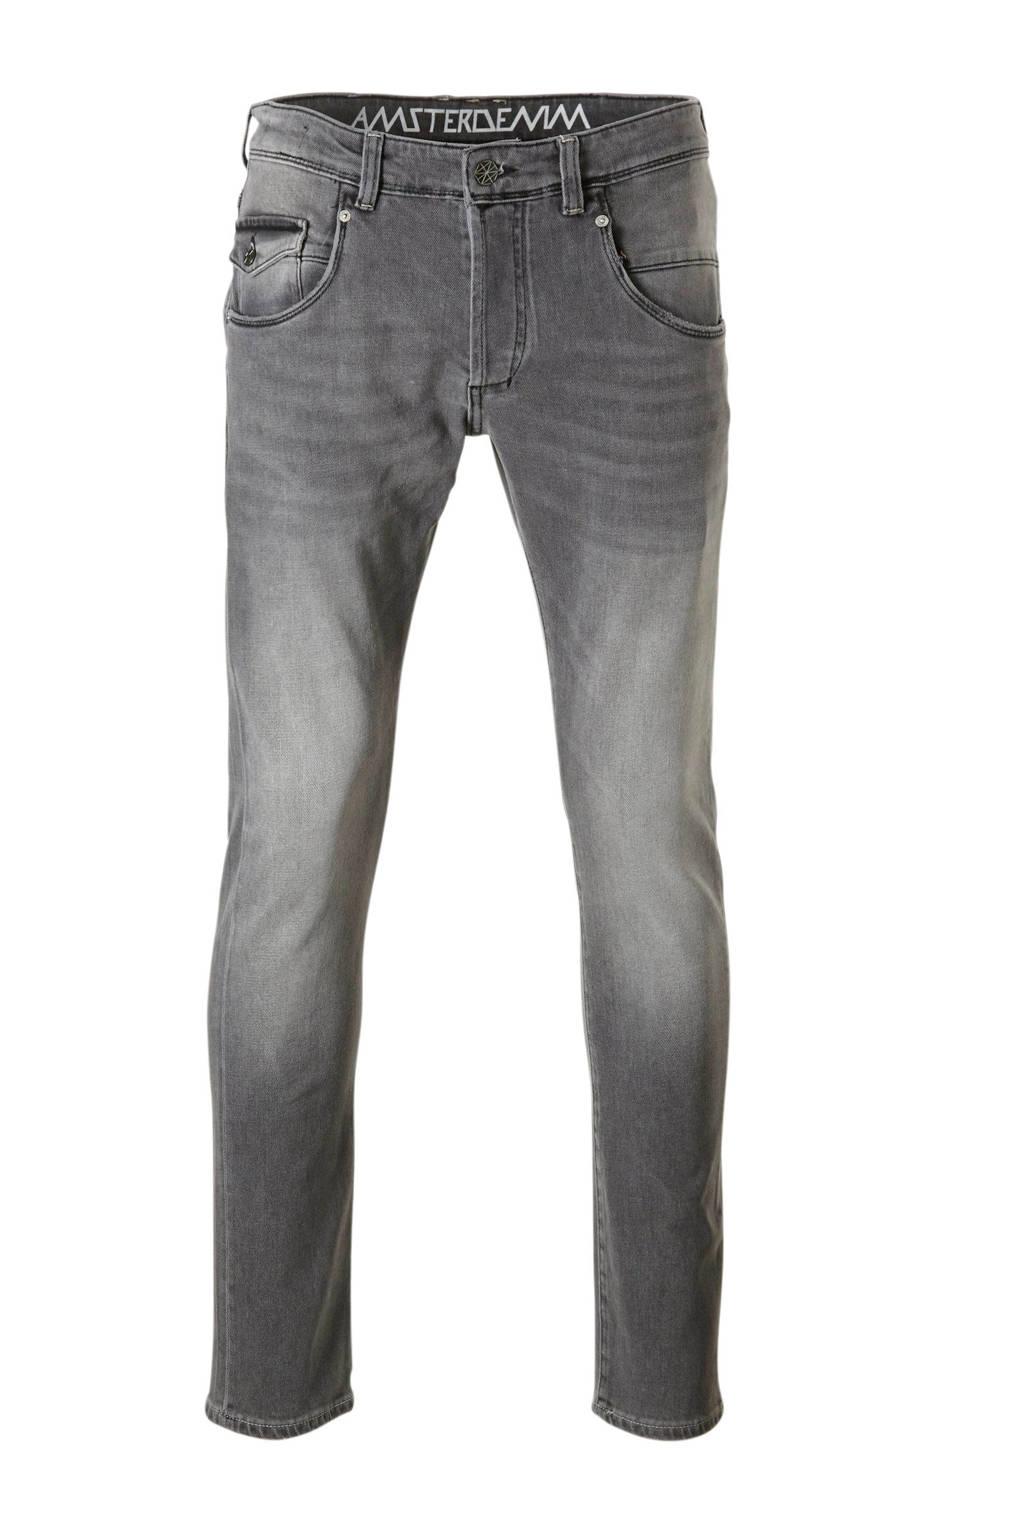 Amsterdenim straight fit jeans Johan, Betondorp